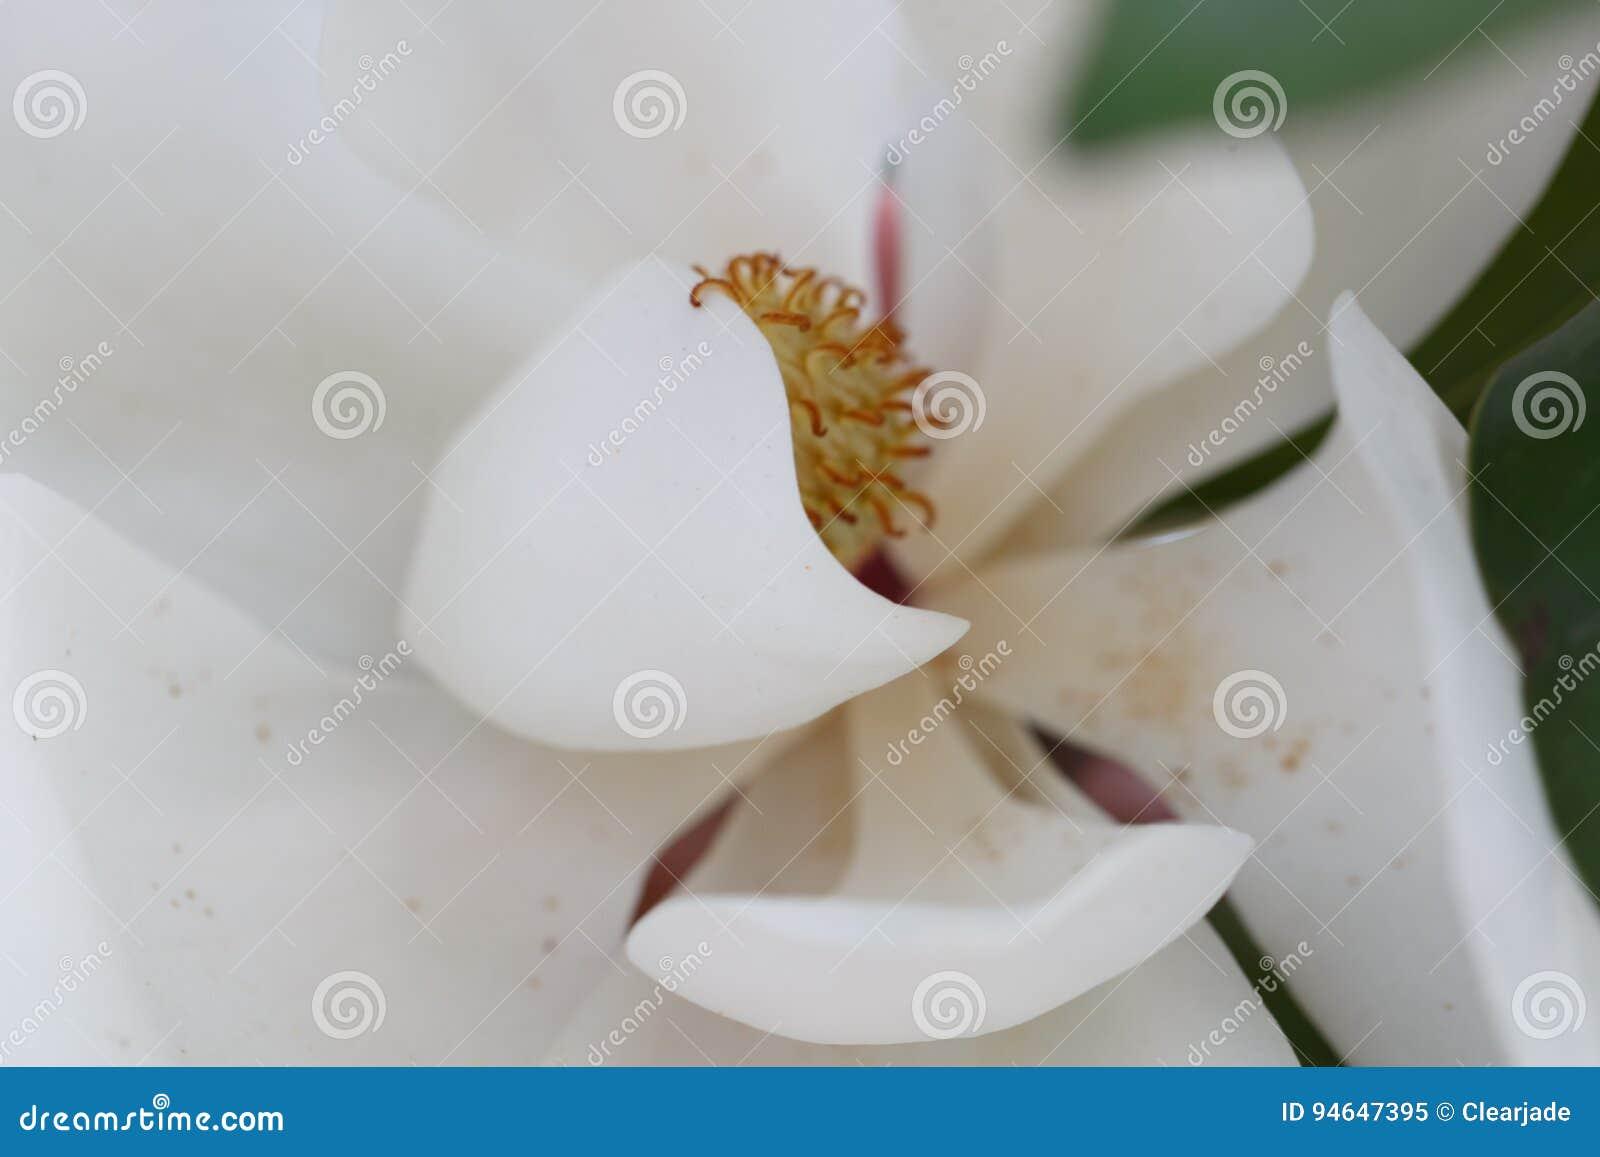 Magnolia white flower in full bloom stock image image of flowers download magnolia white flower in full bloom stock image image of flowers bloom mightylinksfo